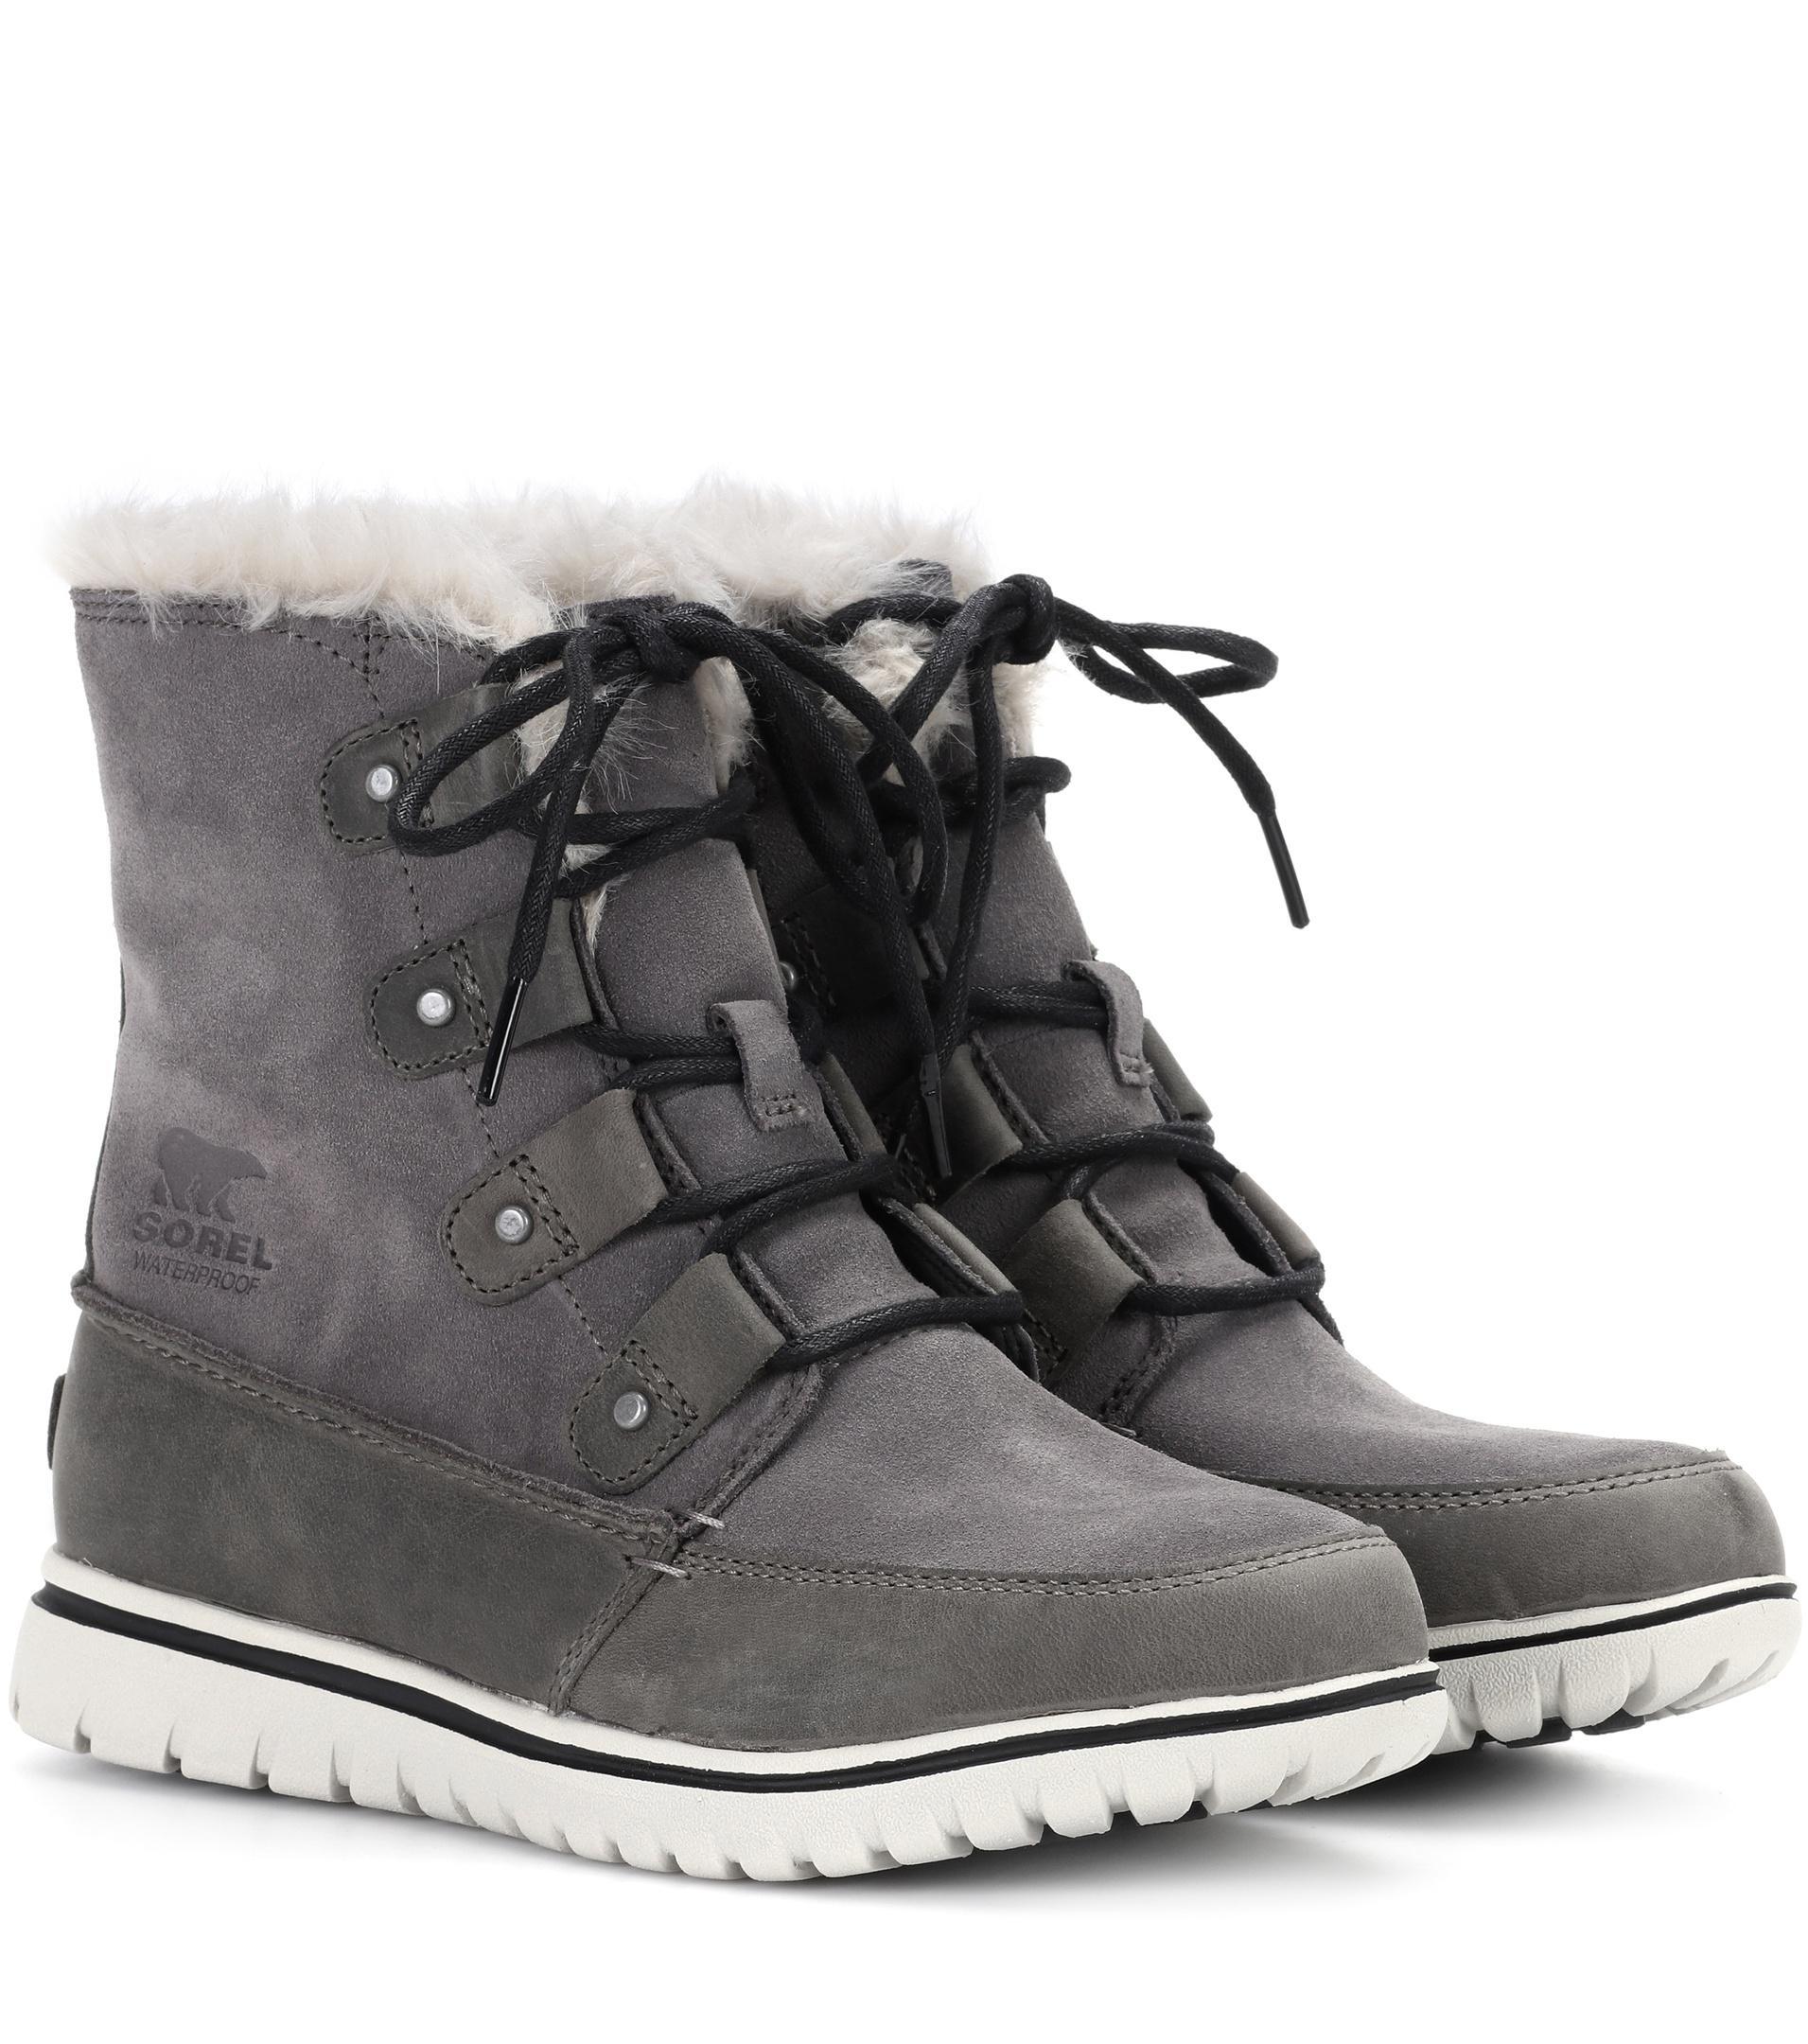 Sorel. Women's Gray Cozy Joan Suede Ankle Boots